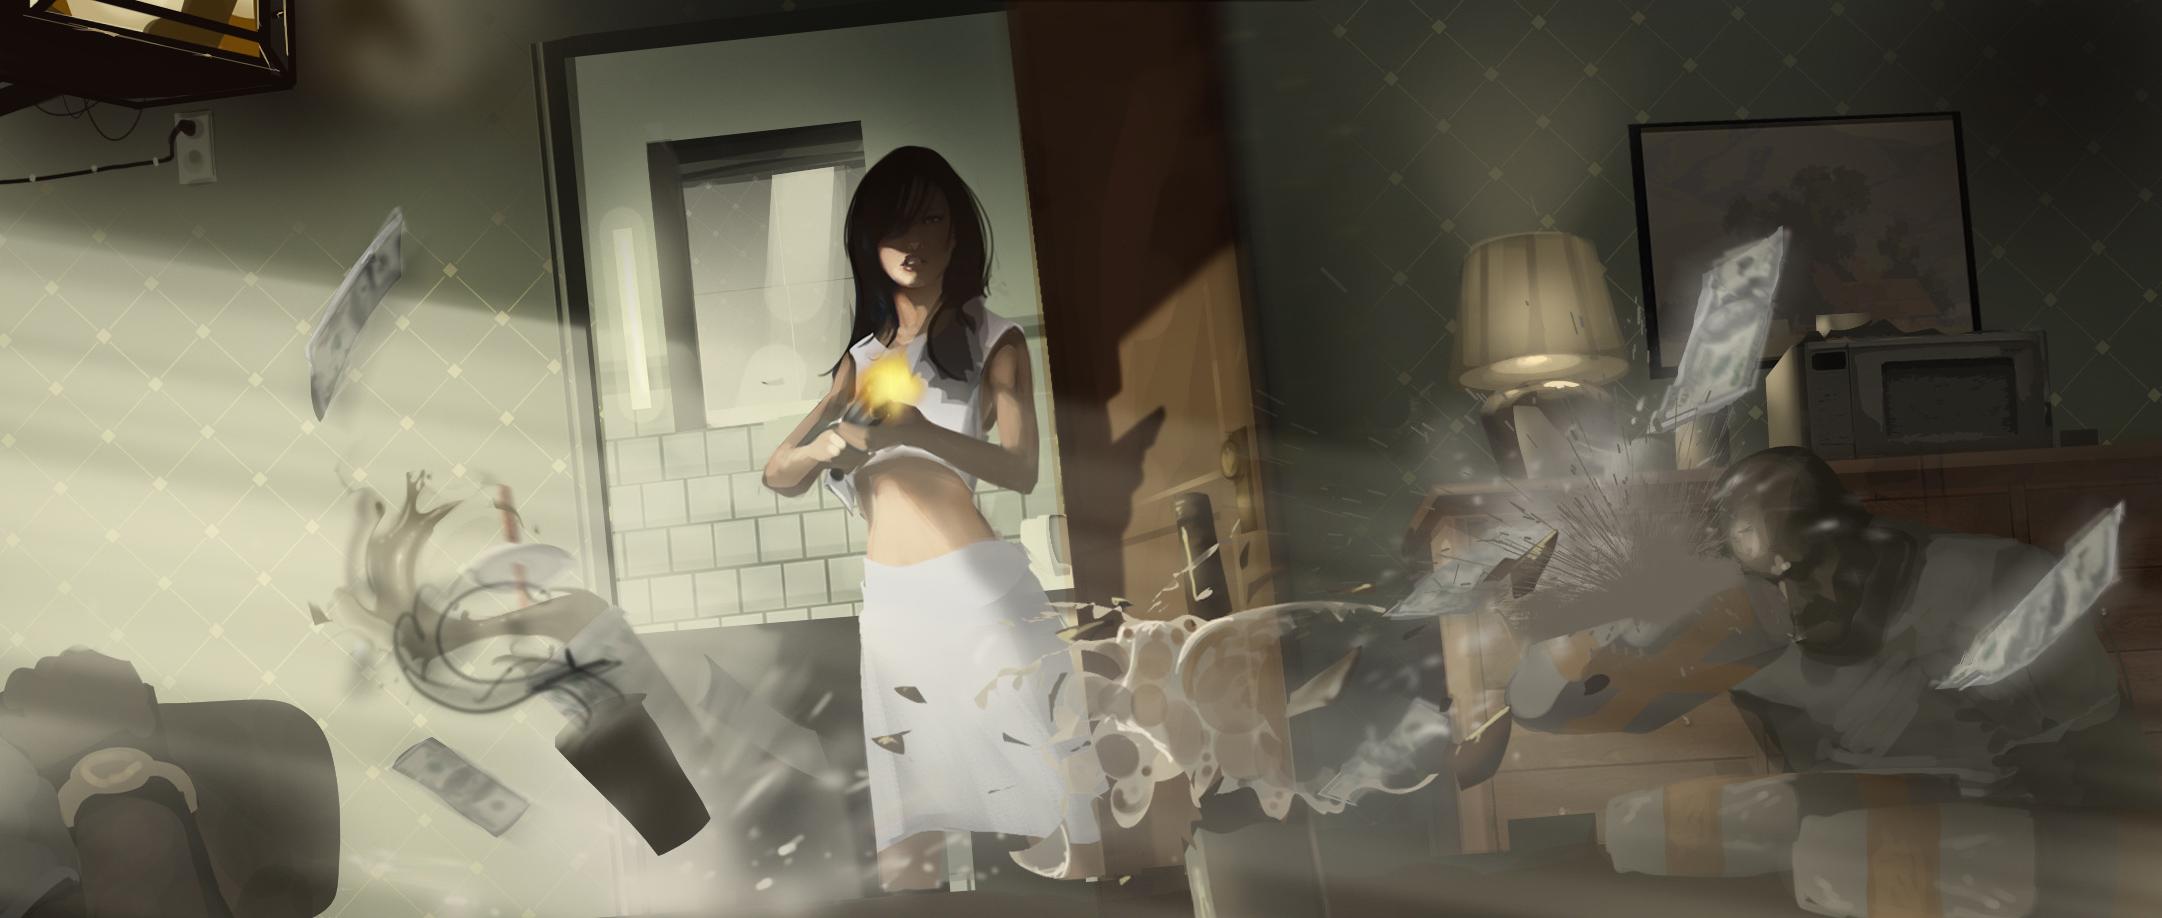 Videogame Concept Artist Interviews